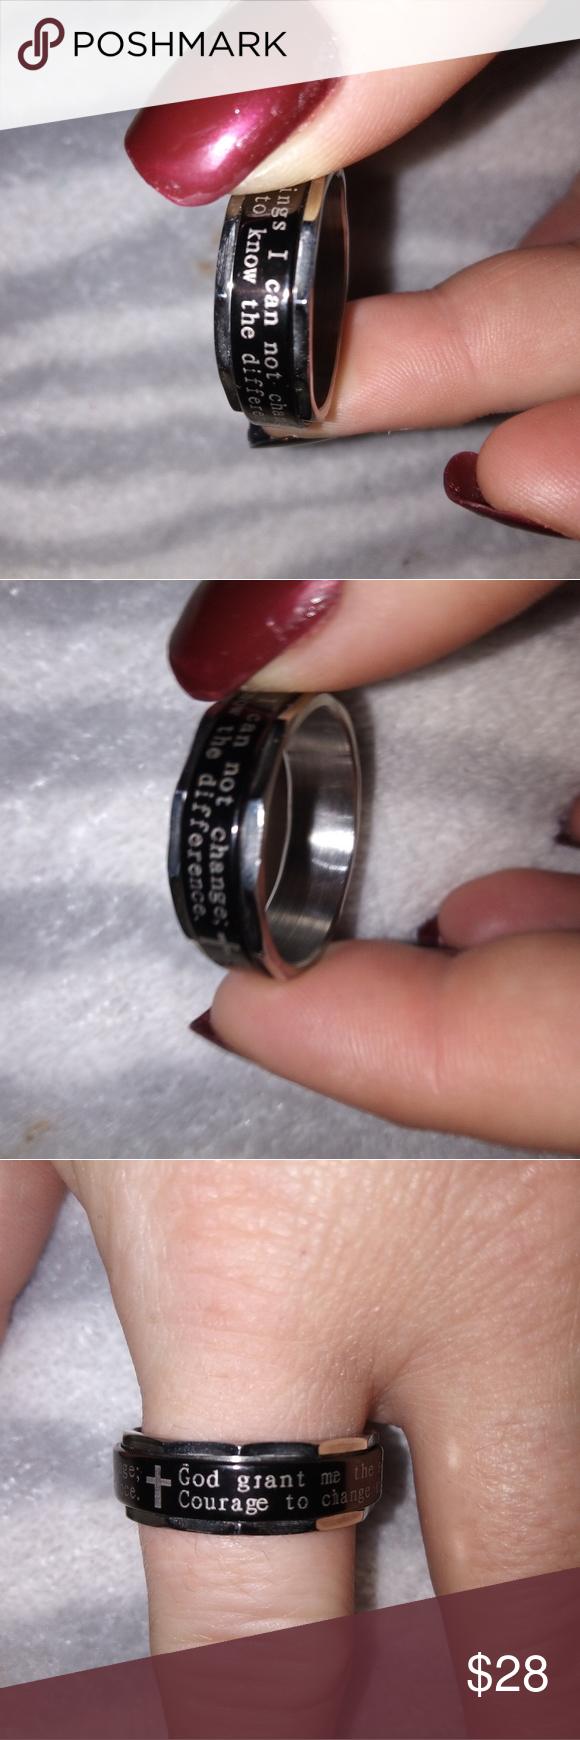 Stainless Spinner Ring W Serenity Prayer On It Serenity Prayer Spinner Rings Stainless Steel Band